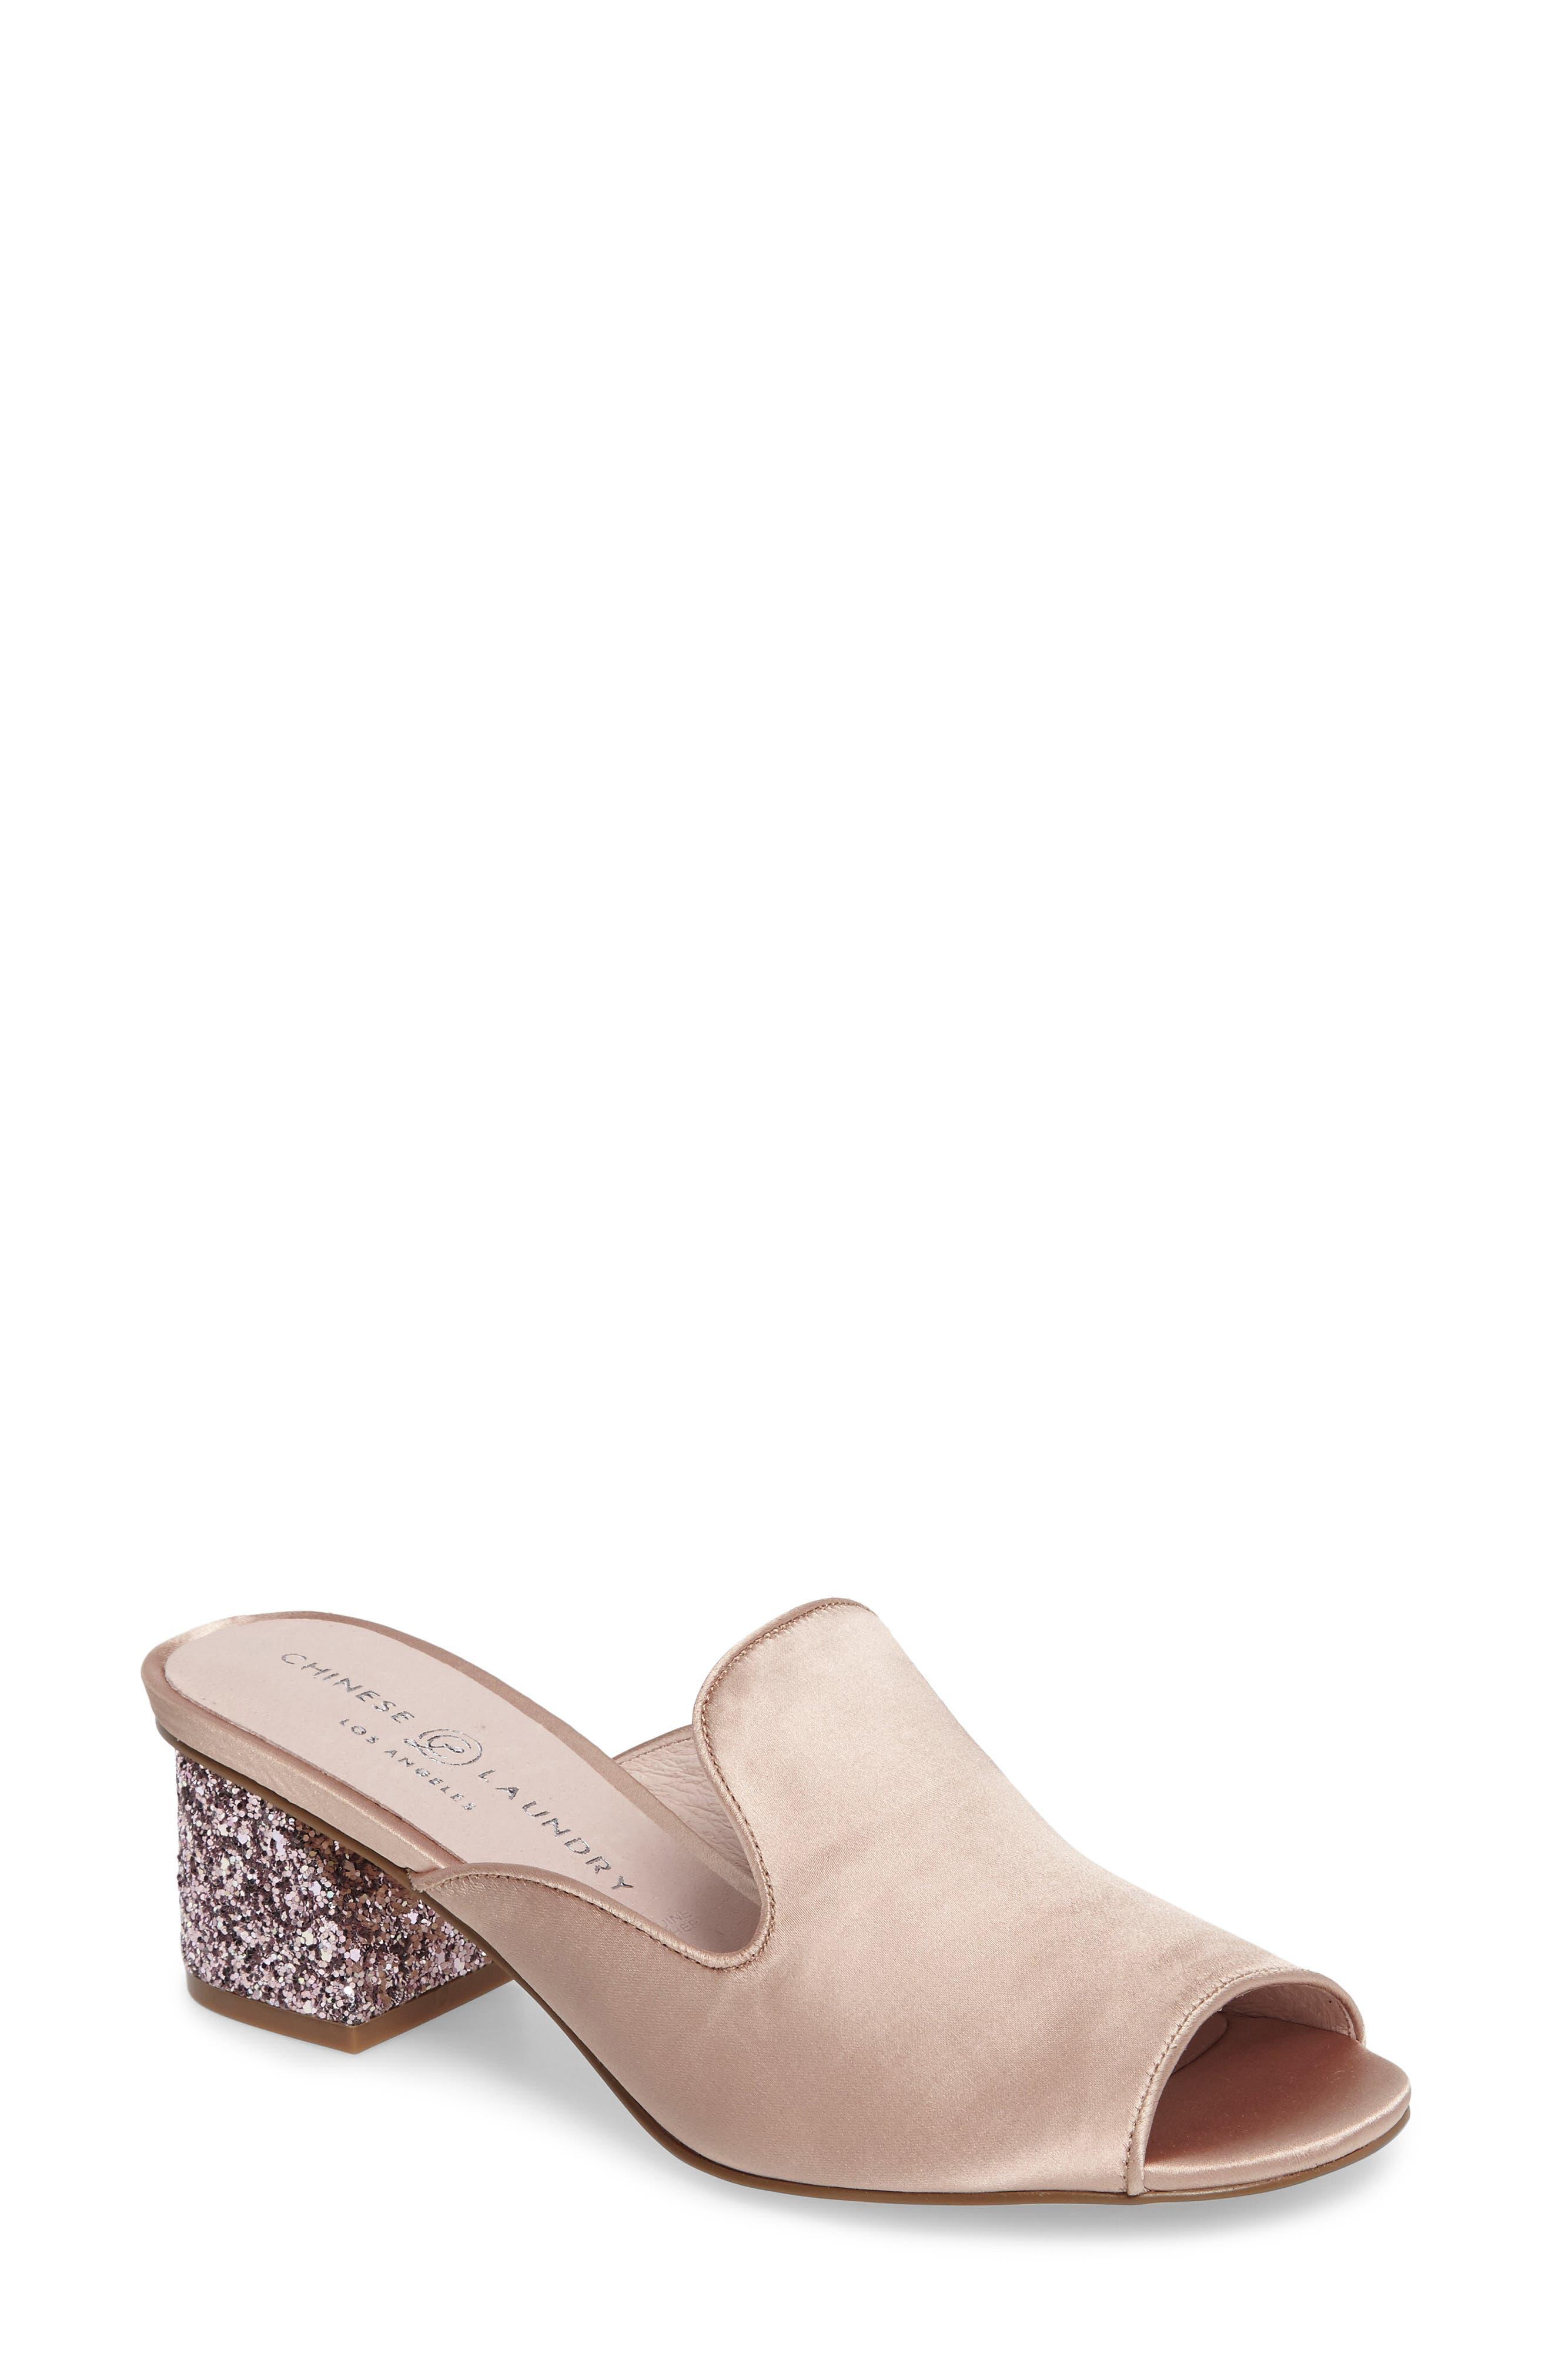 Mara Glitter Loafer Mule,                             Main thumbnail 2, color,